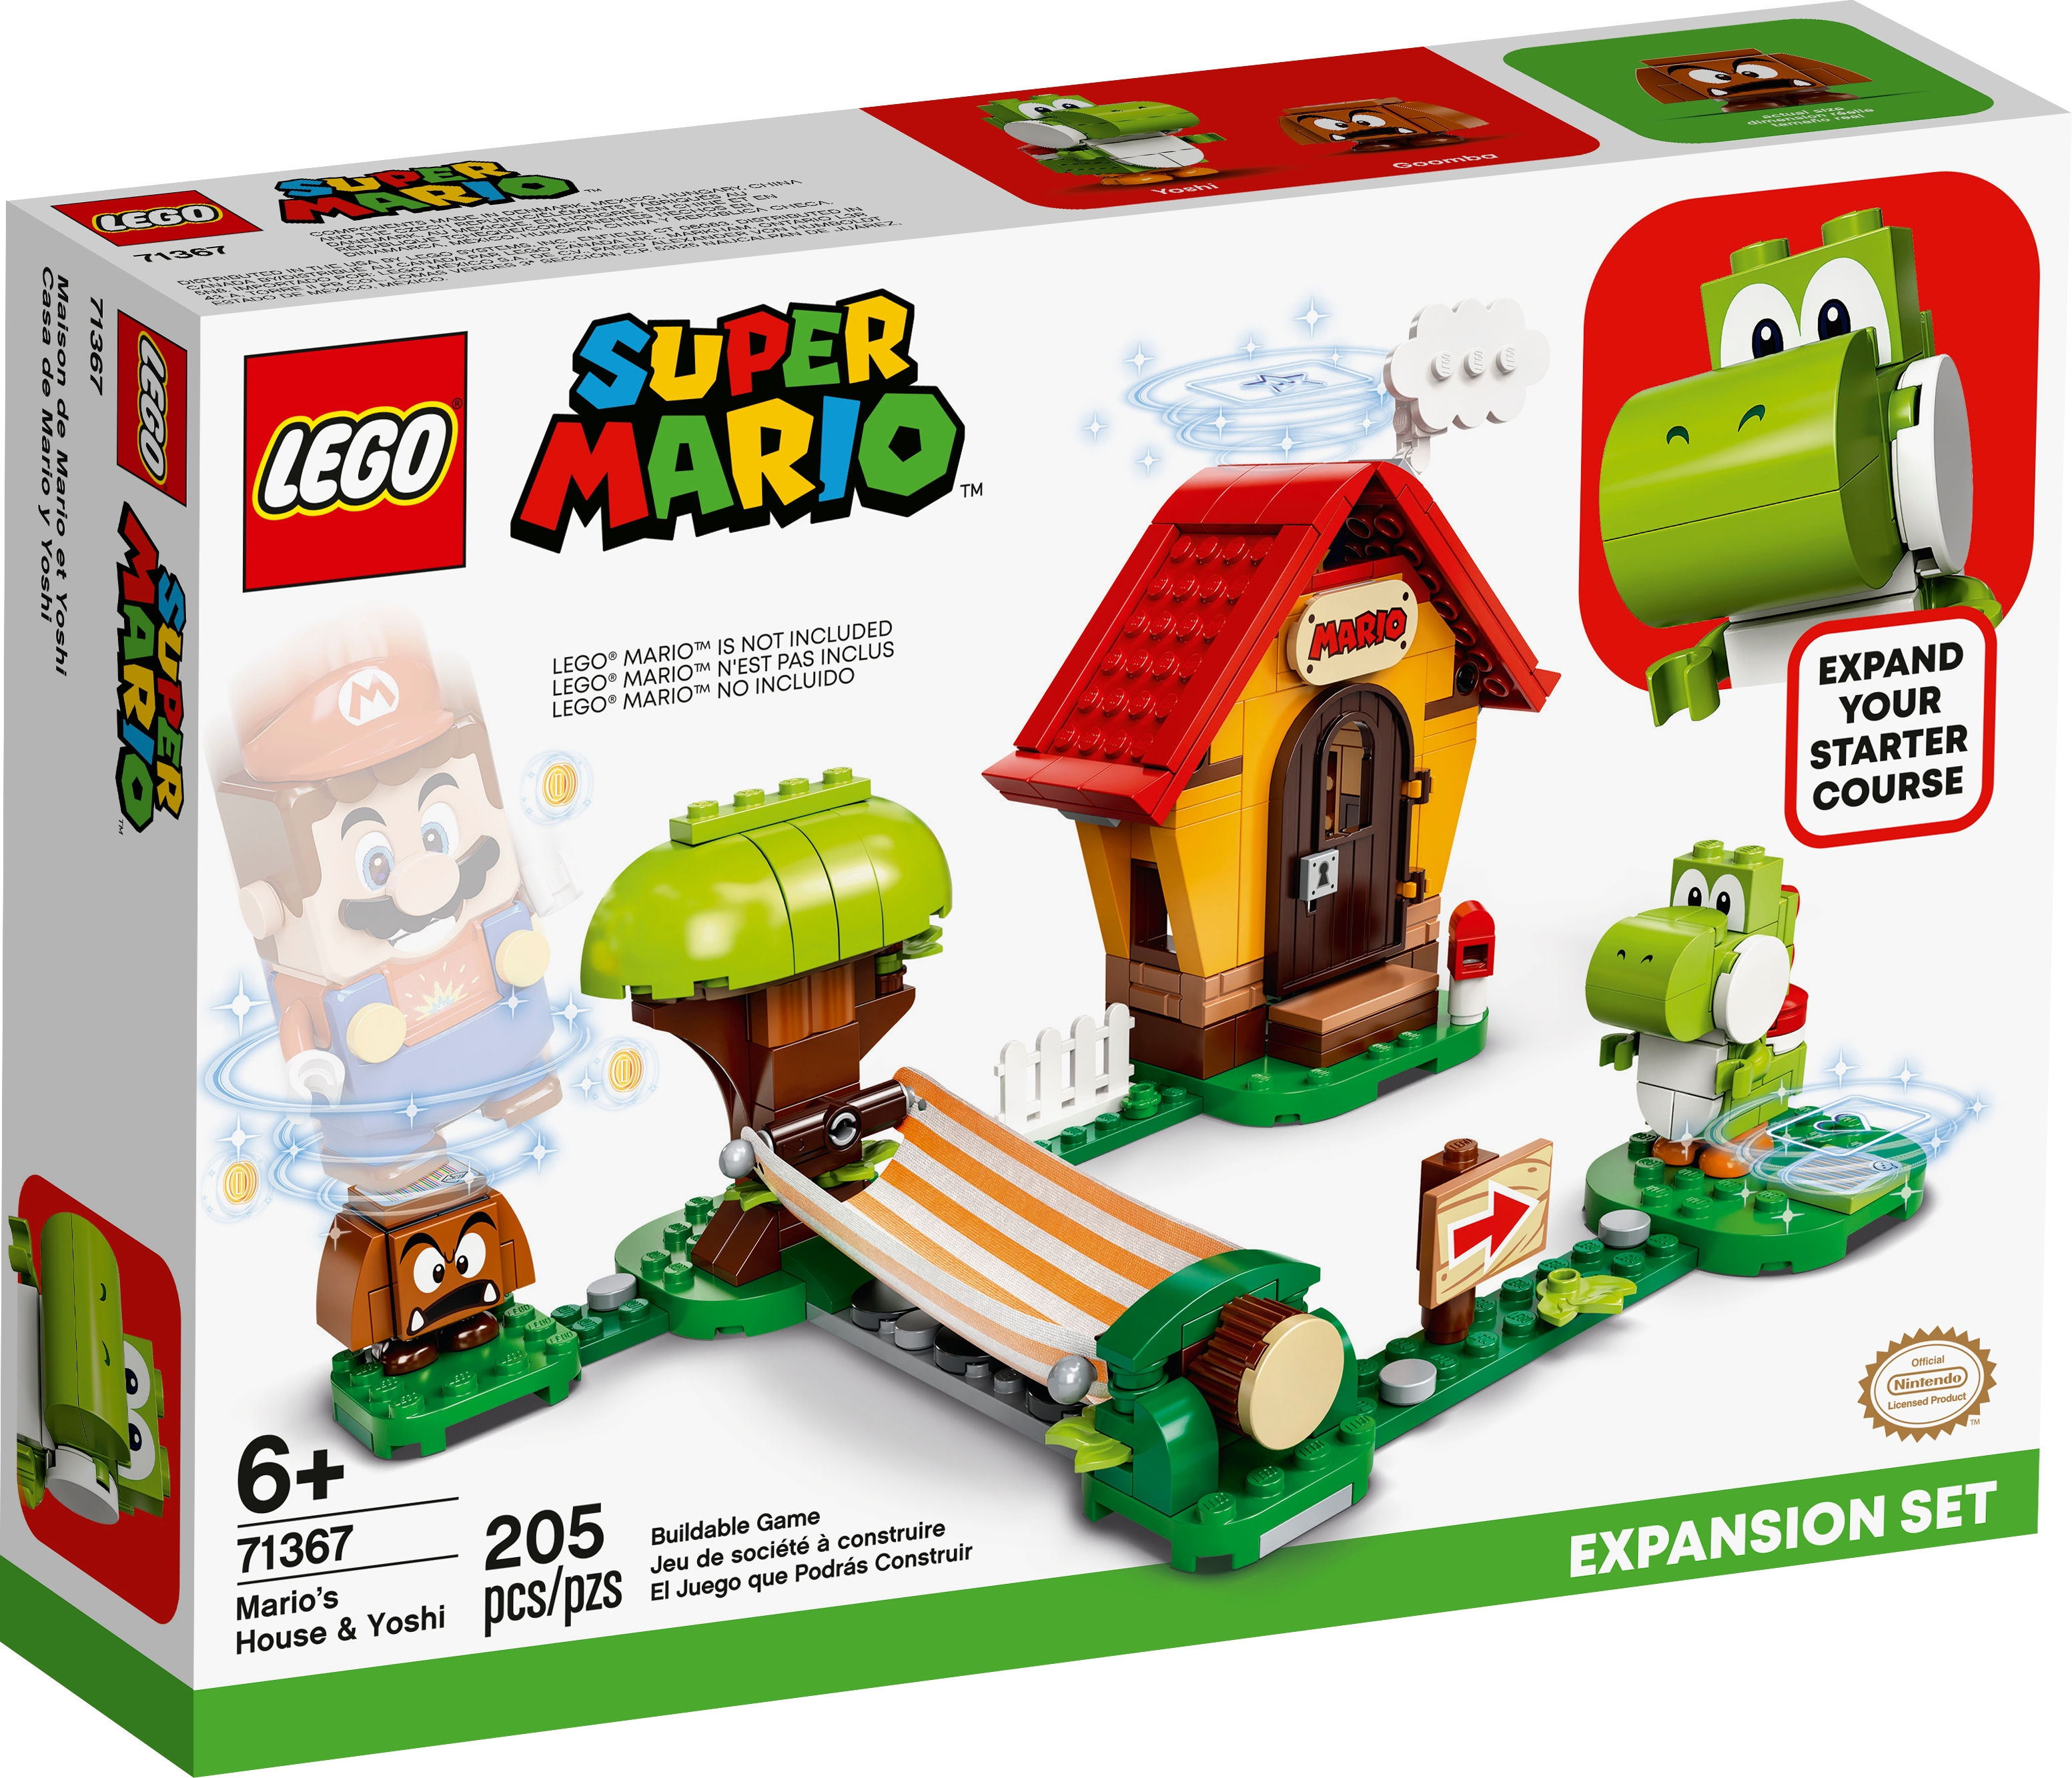 71367 Mario's House & Yoshi